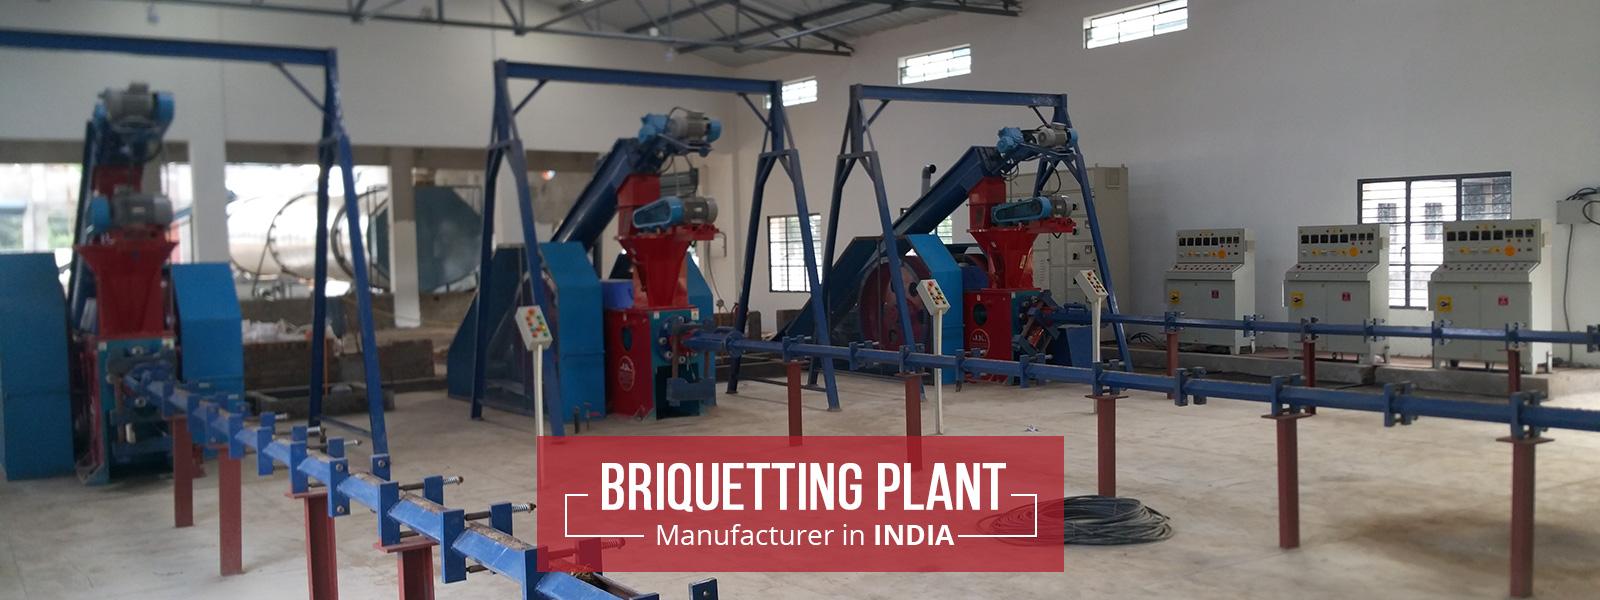 briquetting-plant manufacturer in india